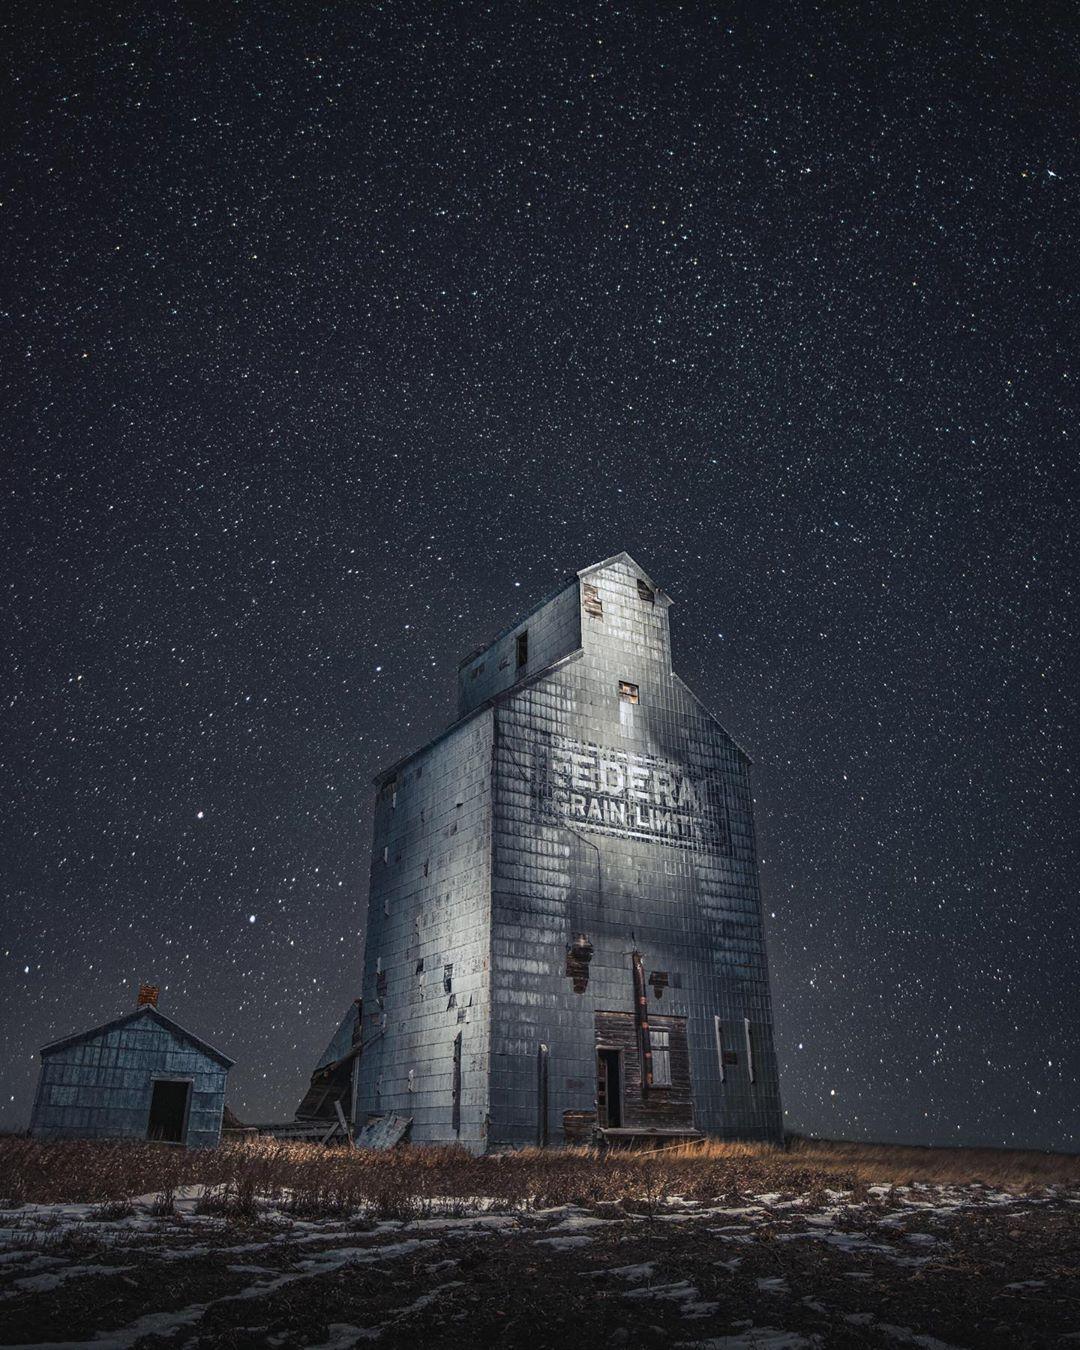 abandoned building under night sky